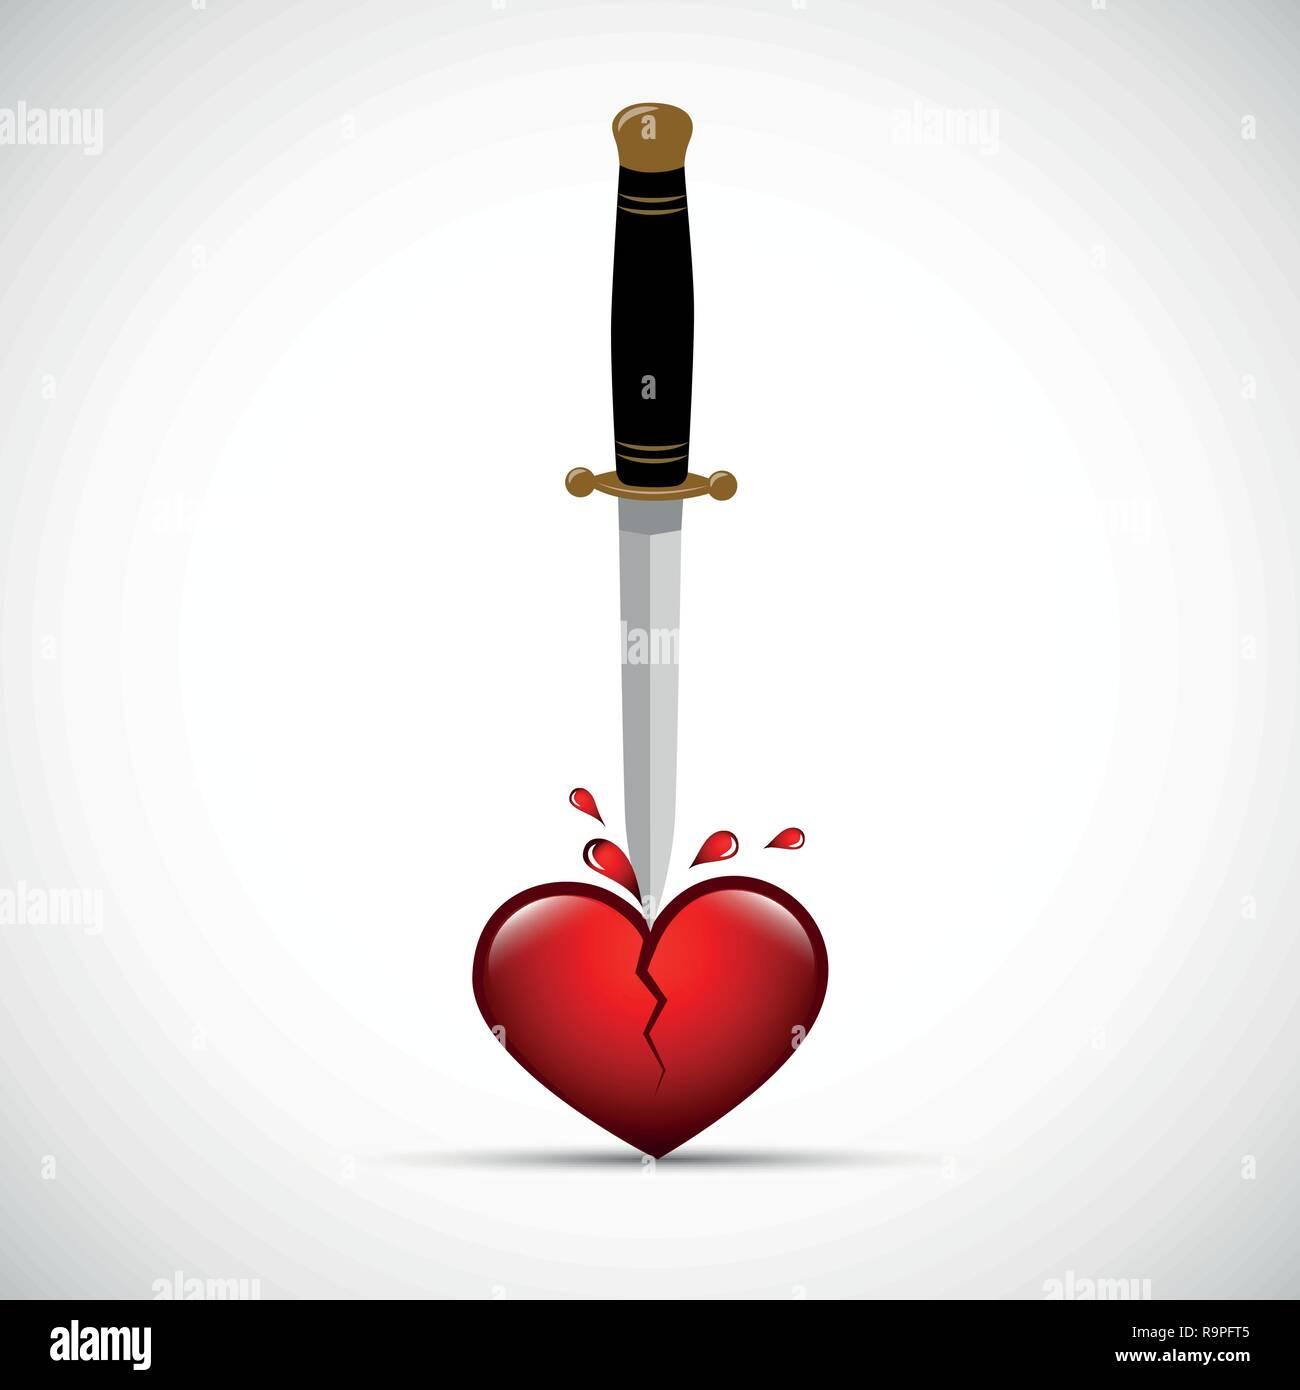 broken bloody heart with dagger vector illustration EPS10 - Stock Vector